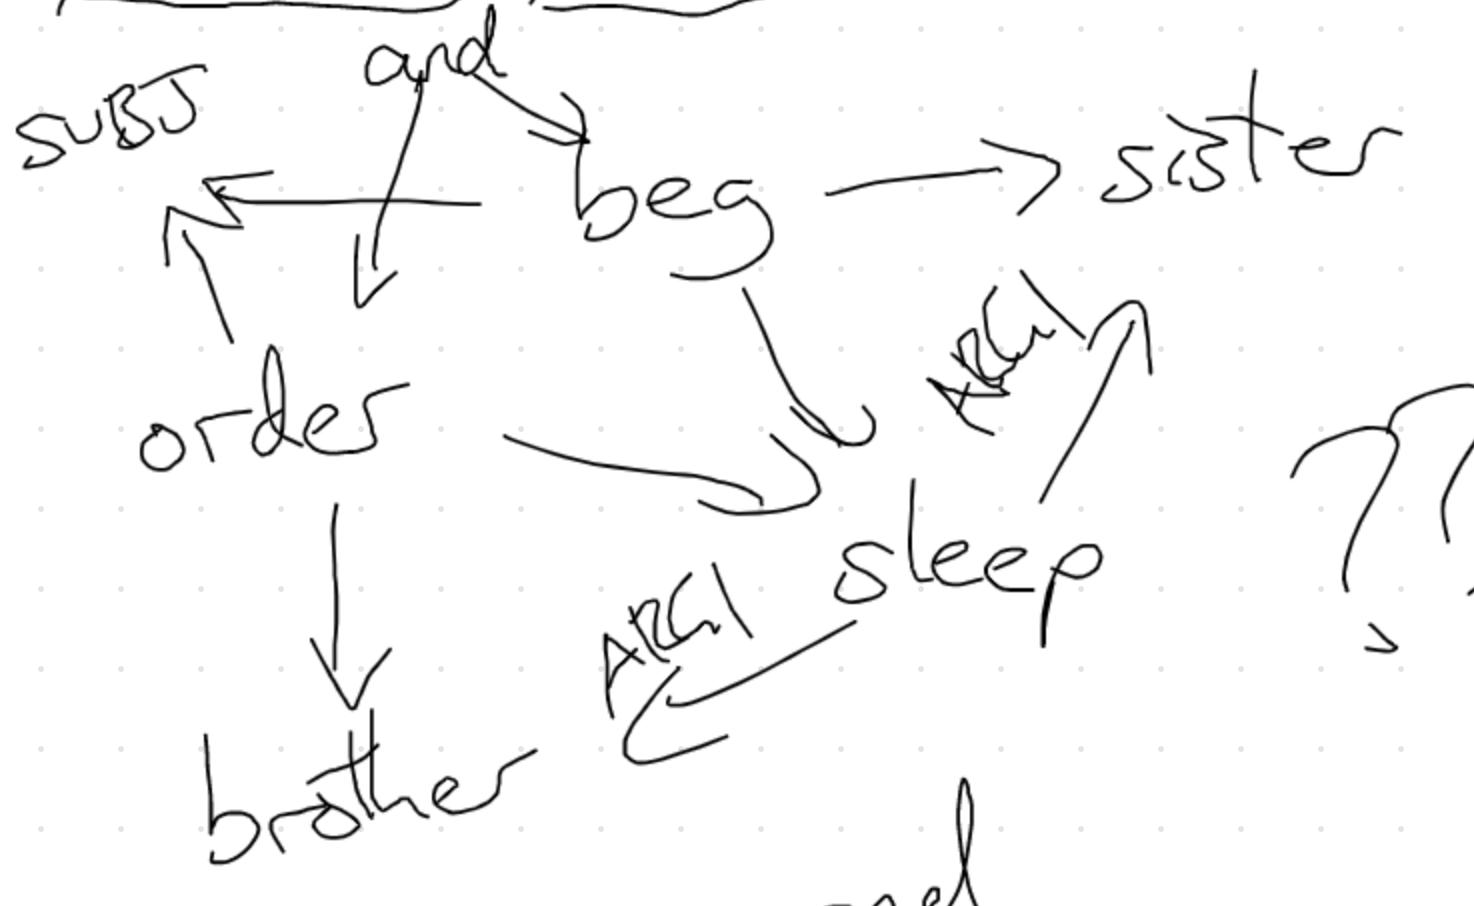 http://faculty.washington.edu/ebender/VirtualSummit/sleep-with-2-ARG1.png